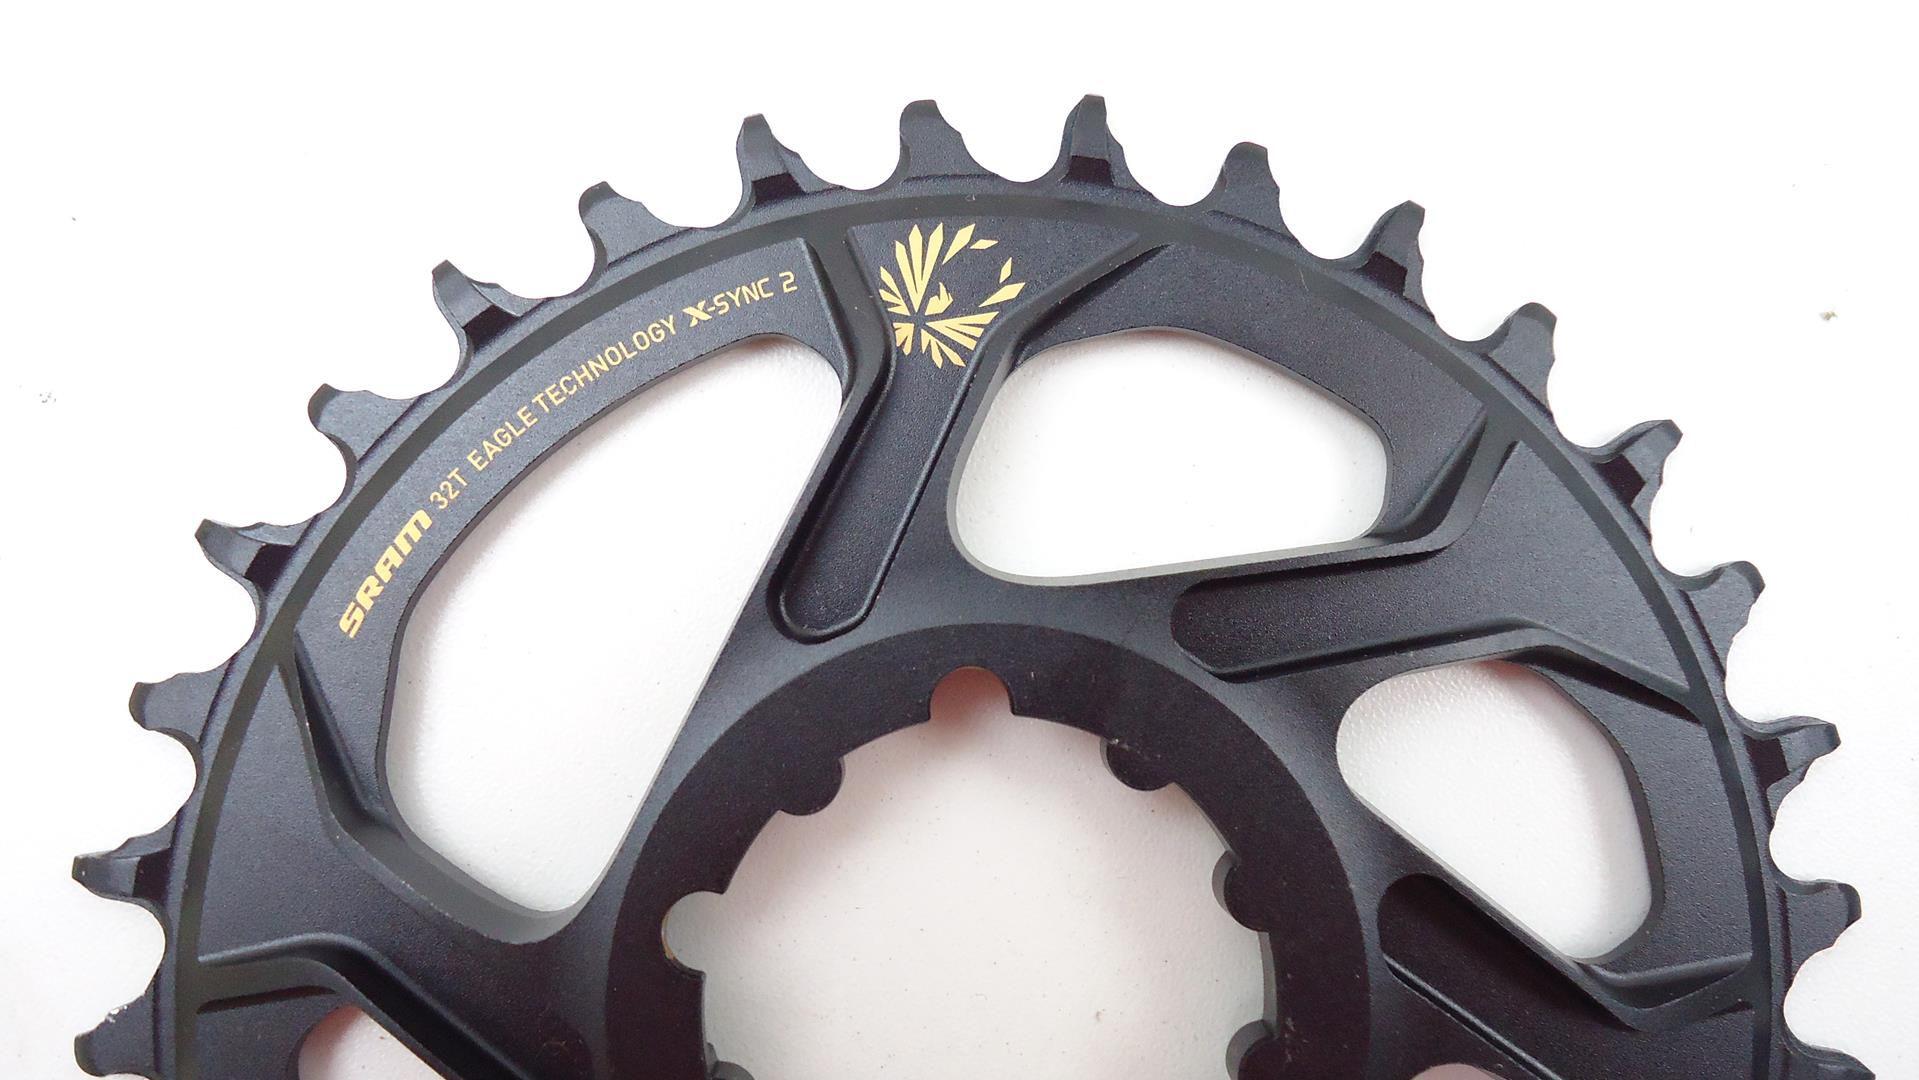 Coroa Unica Bicicleta Sram XX1 Eagle Gold 32 dentes Direct Mount 6mm Para Uso 1x12 GX X01 Eagle 12v